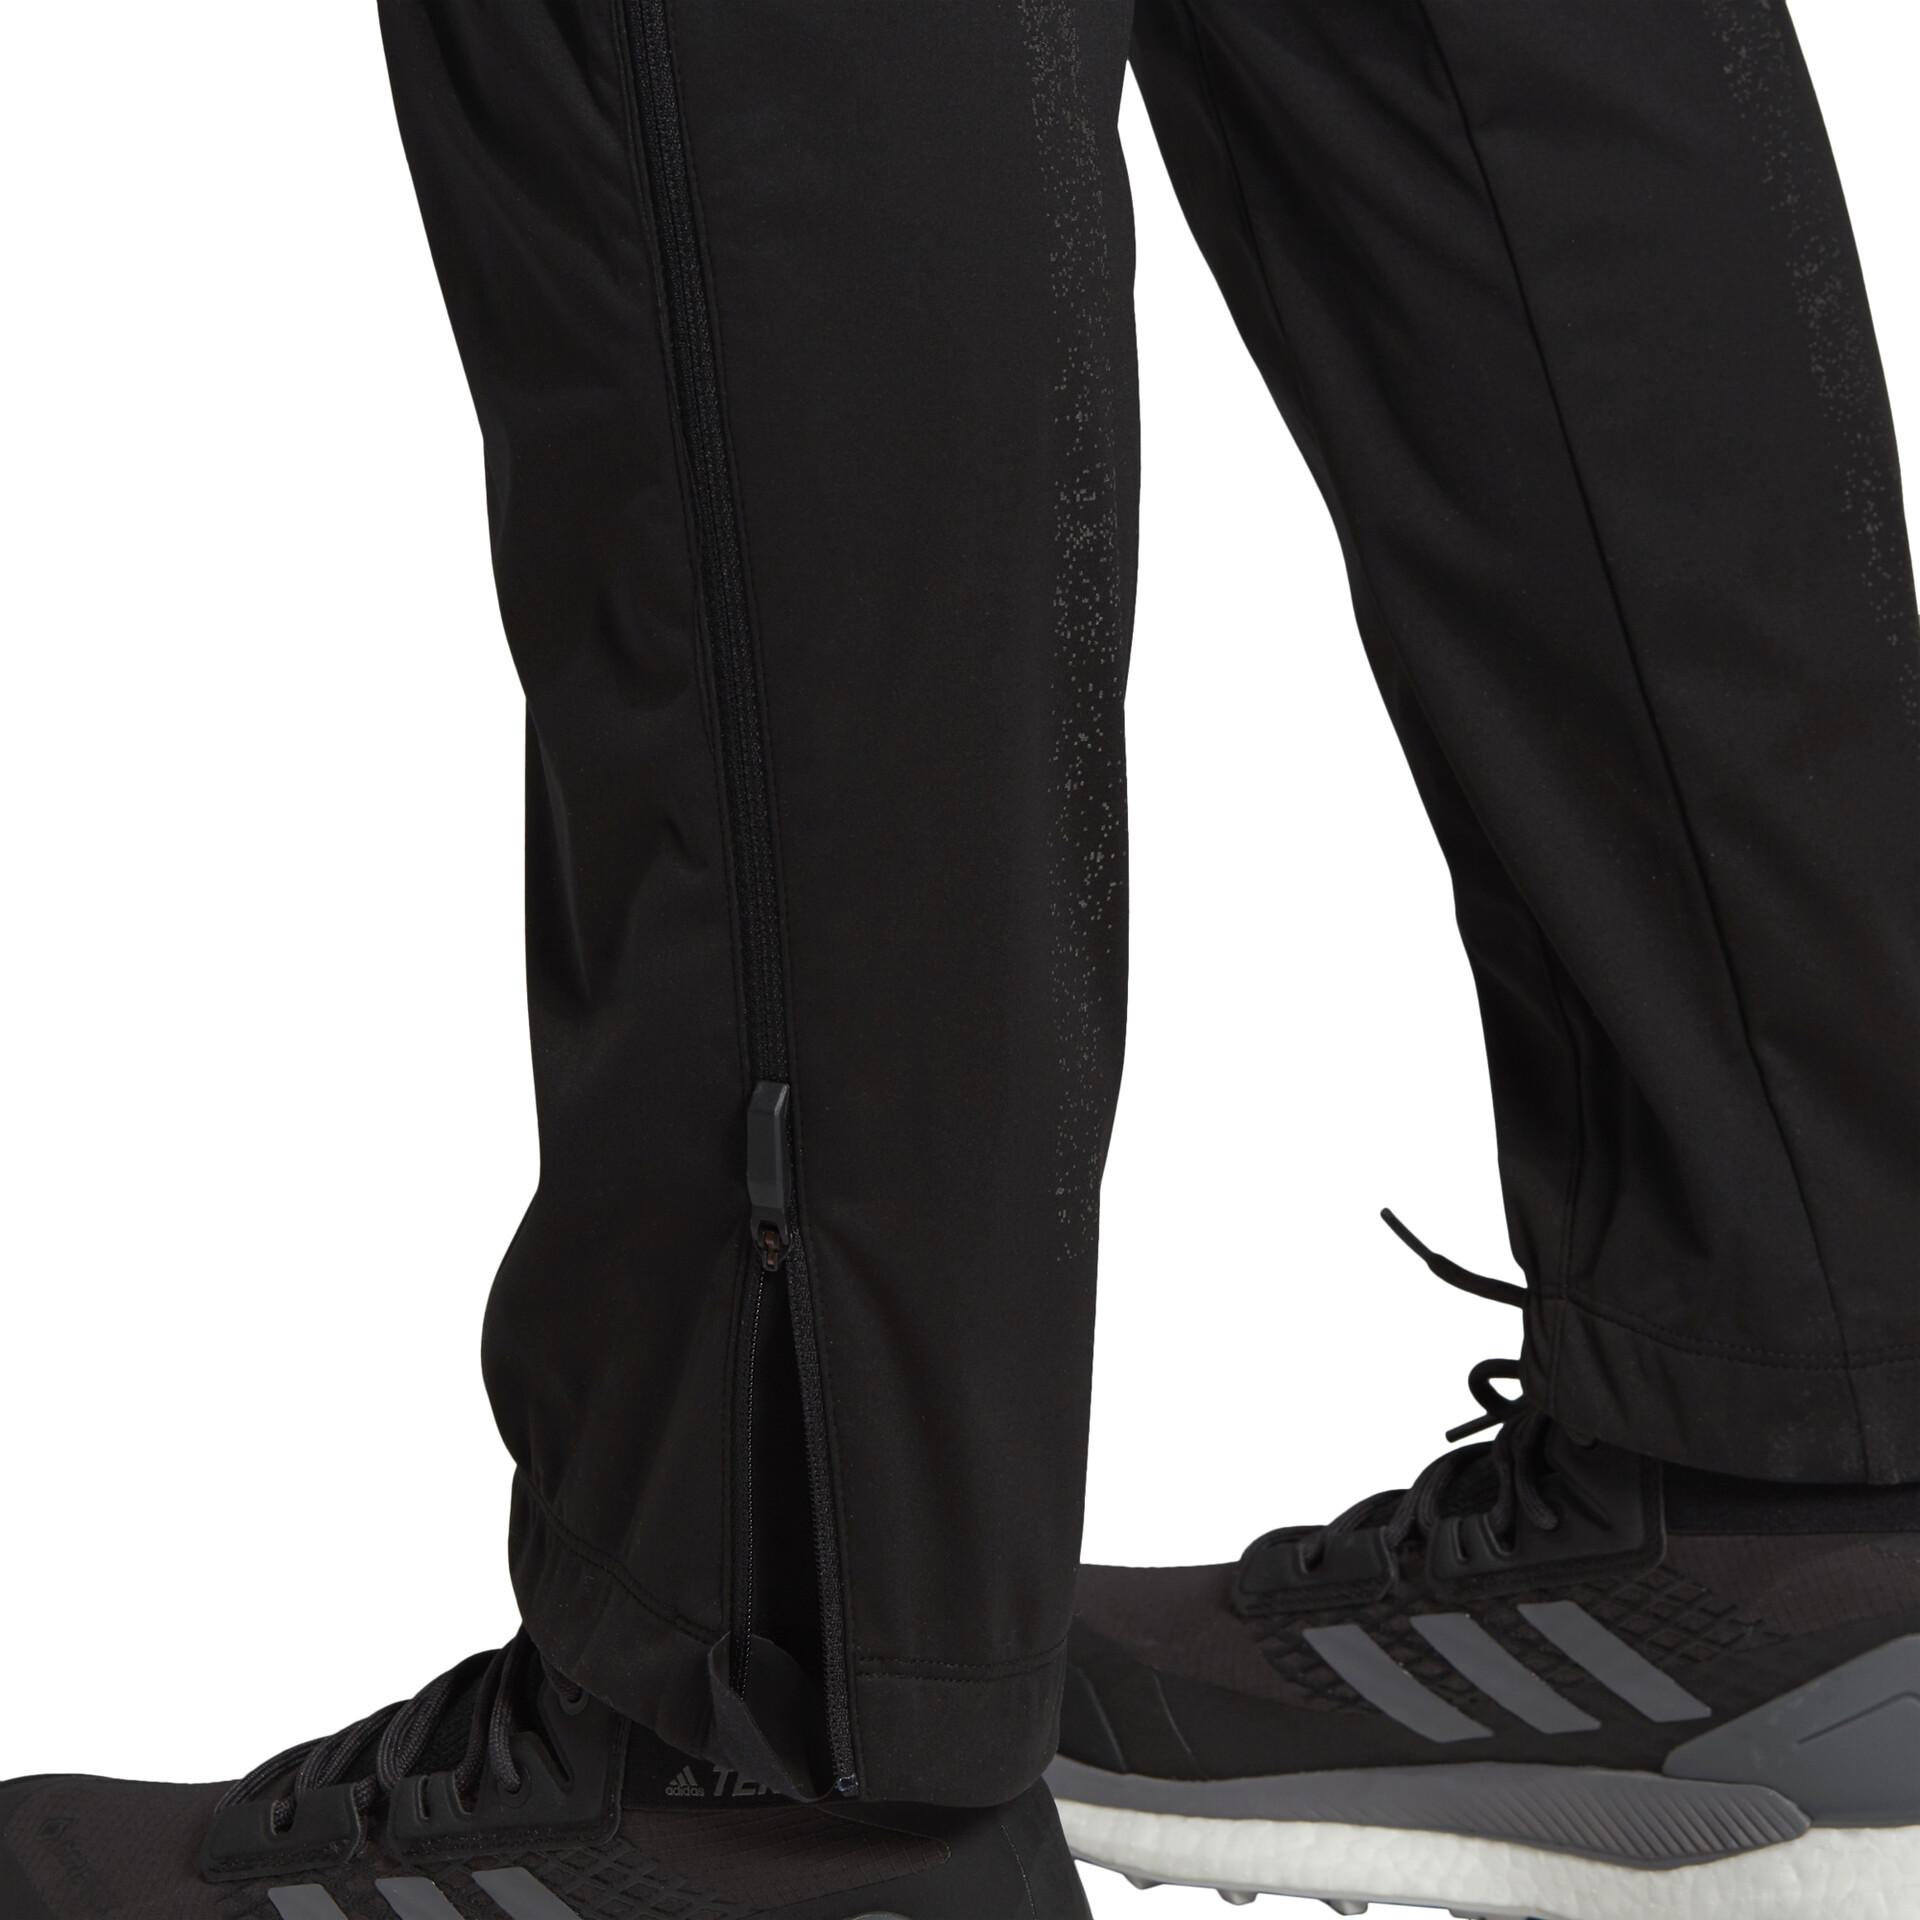 Xperior Adidas Terrex Damen Hose Black hdQrtsC